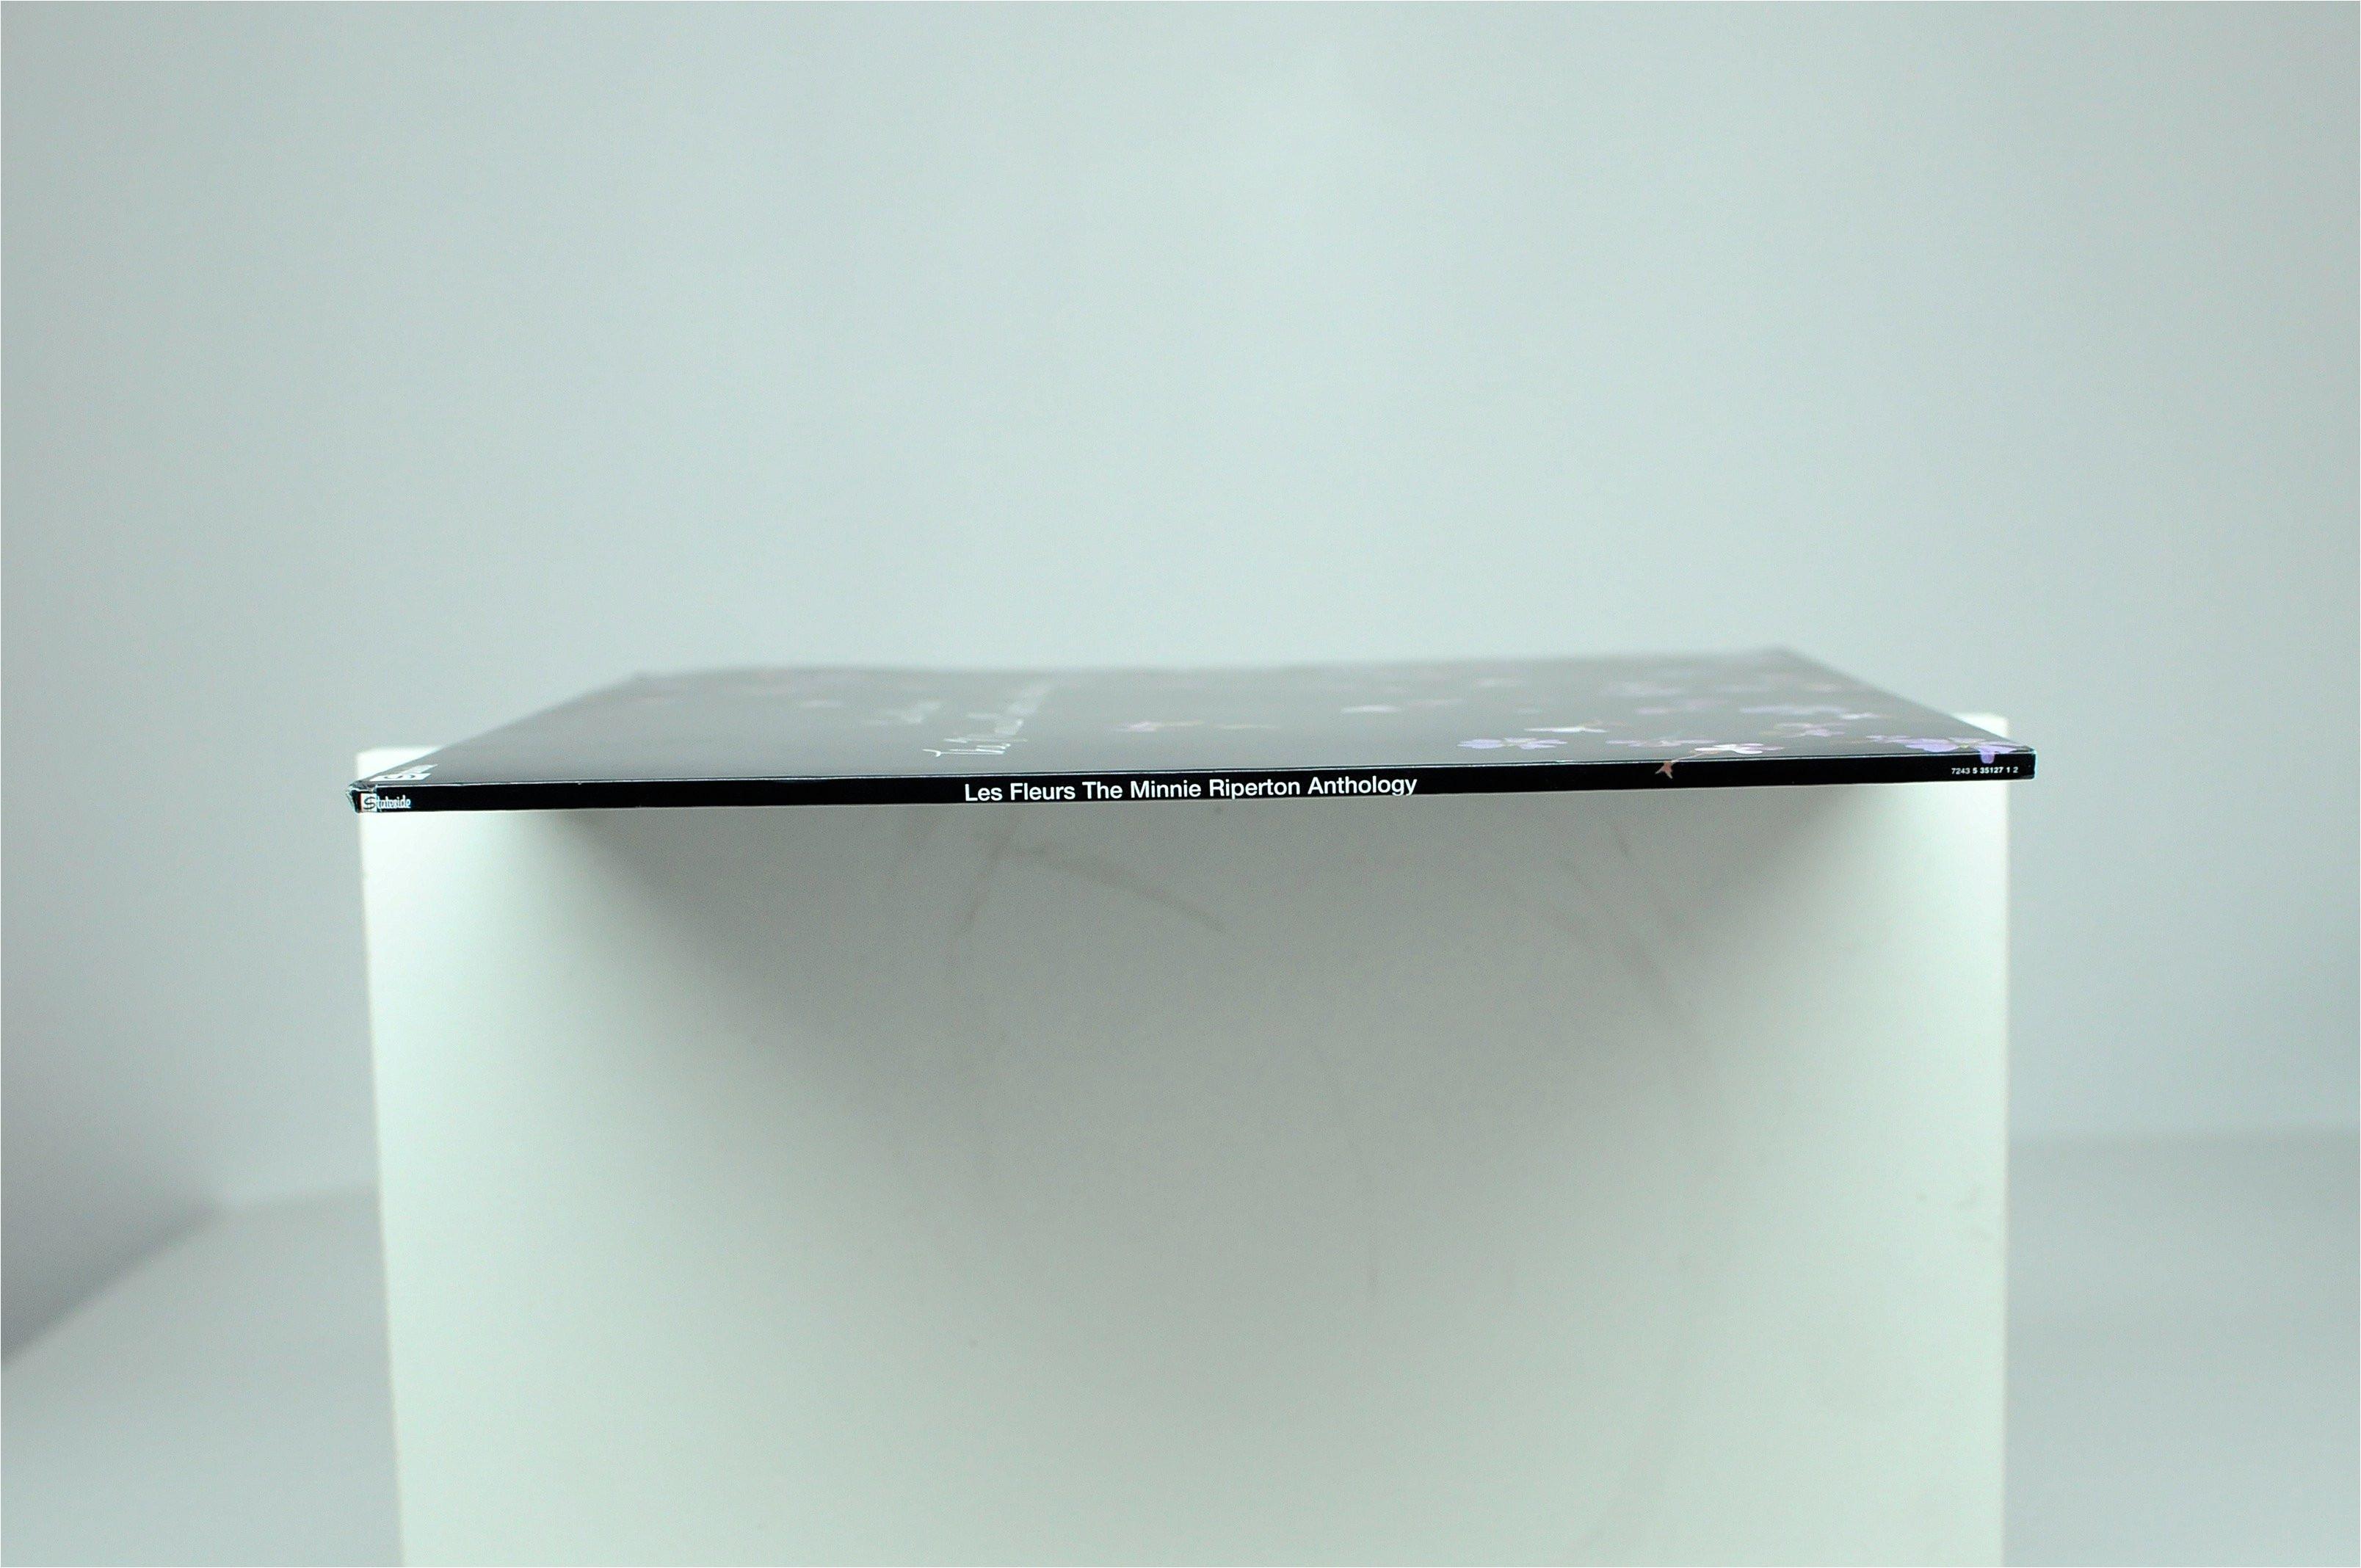 Appliances Duluth Mn Craigslist Https Tictail Com S ...